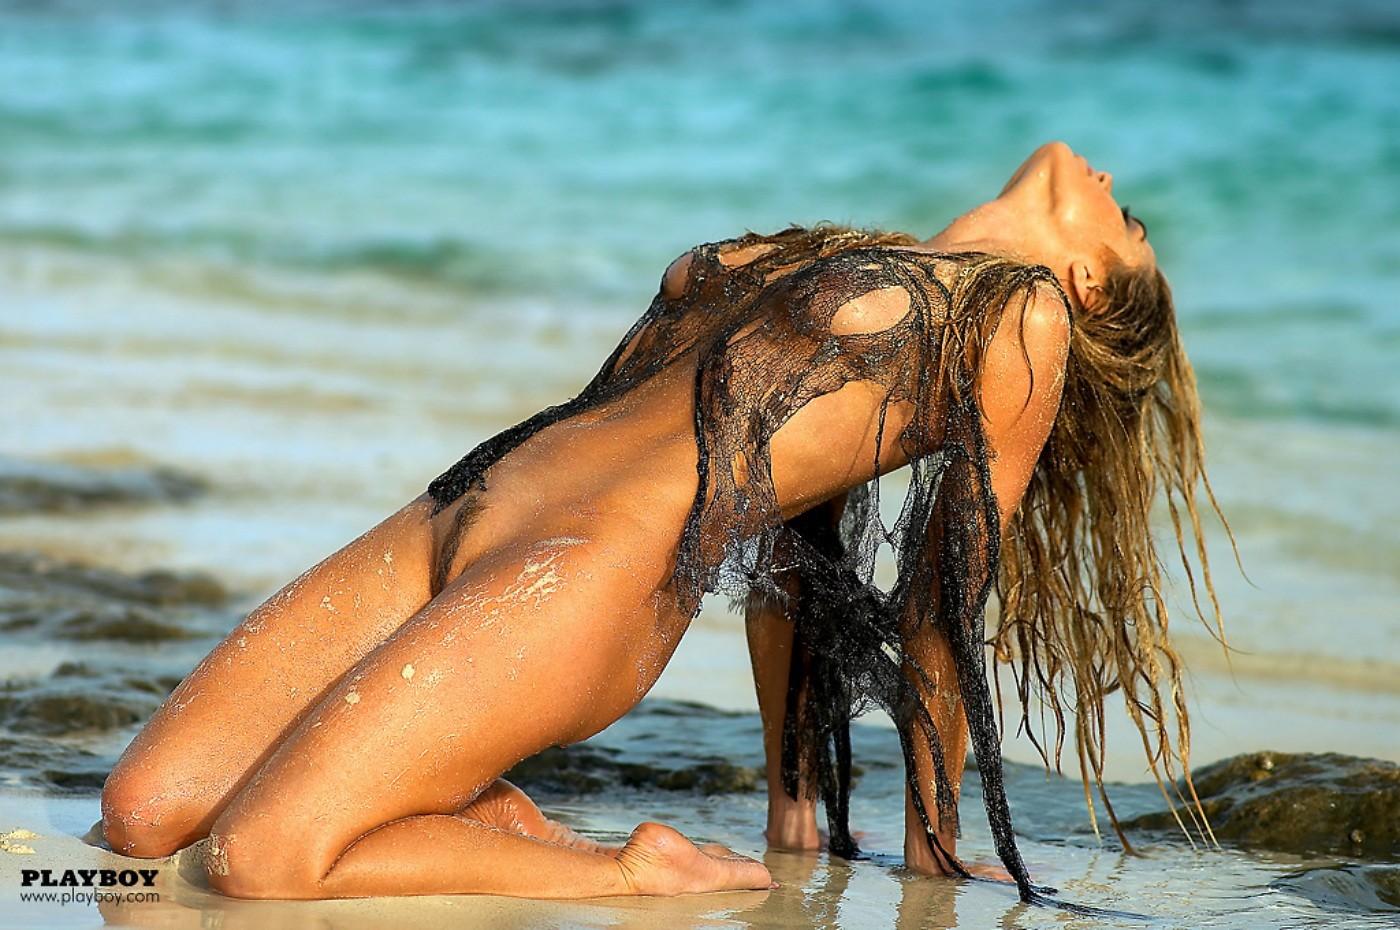 denise richard nude